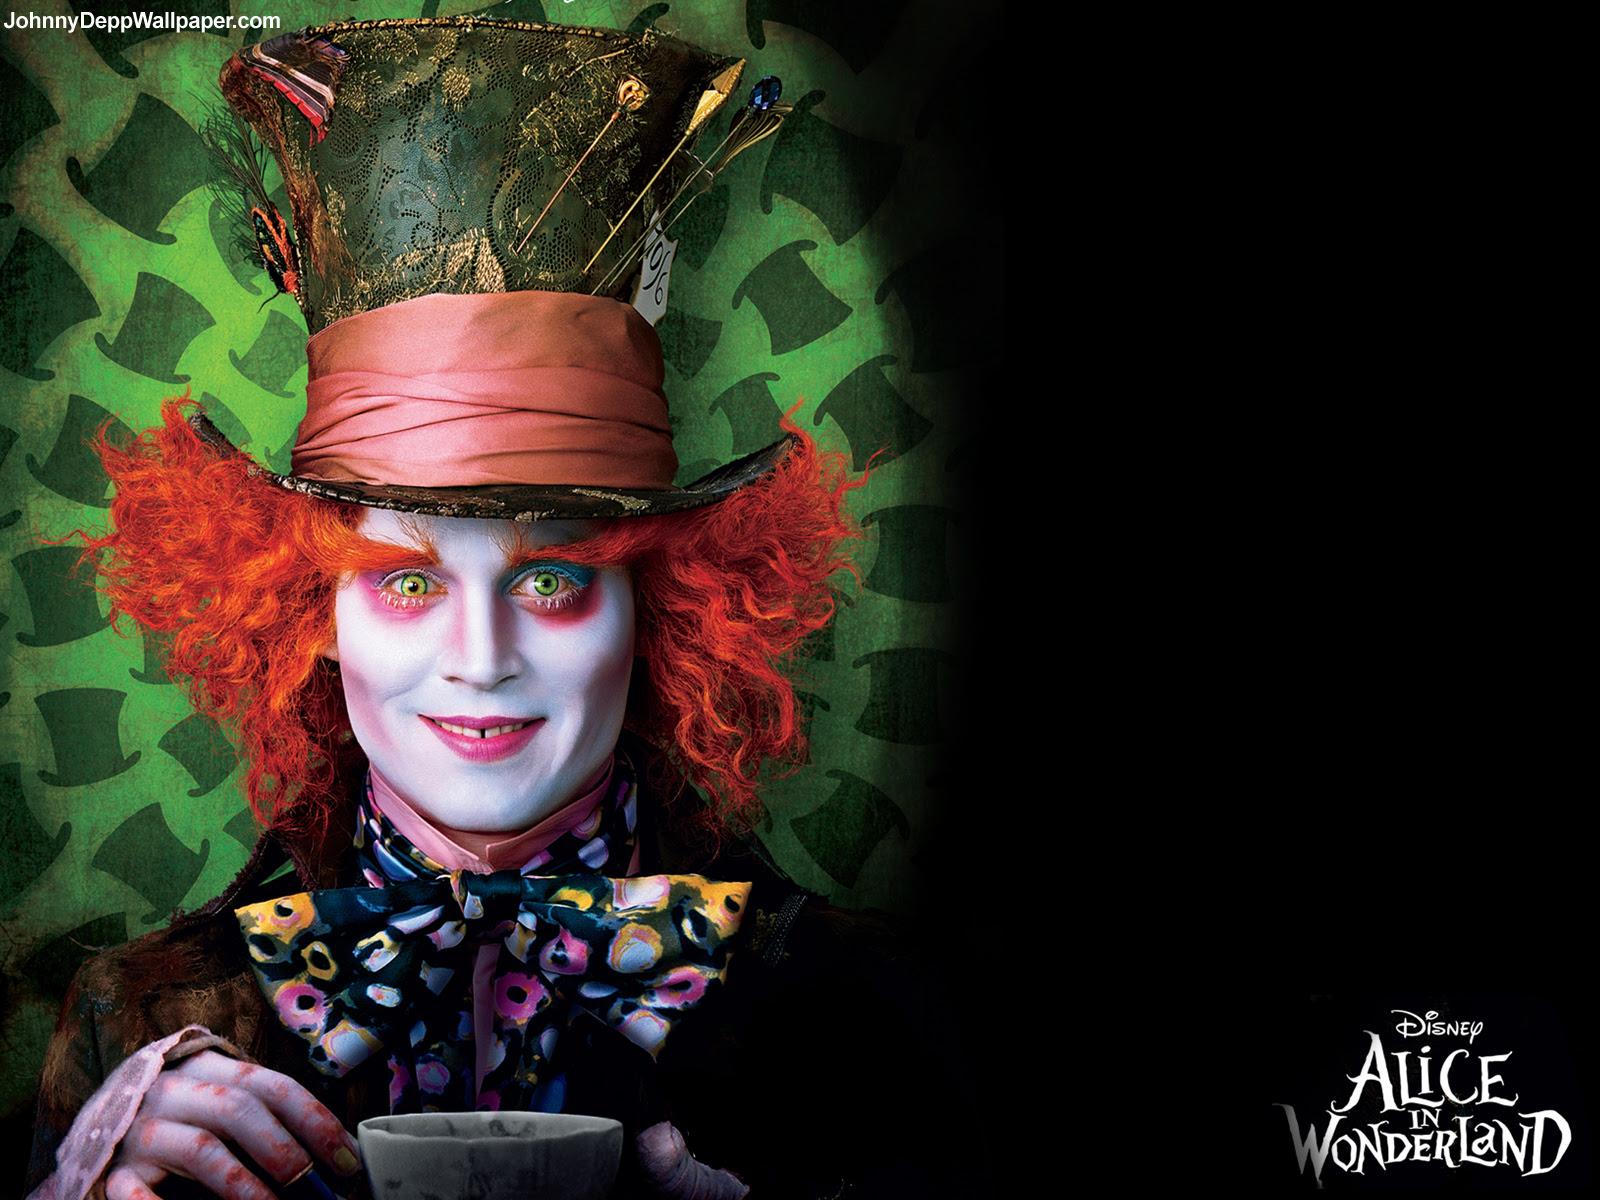 Johnny Depp Wallpaper Alice In Wonderland Wallpaper Alice In